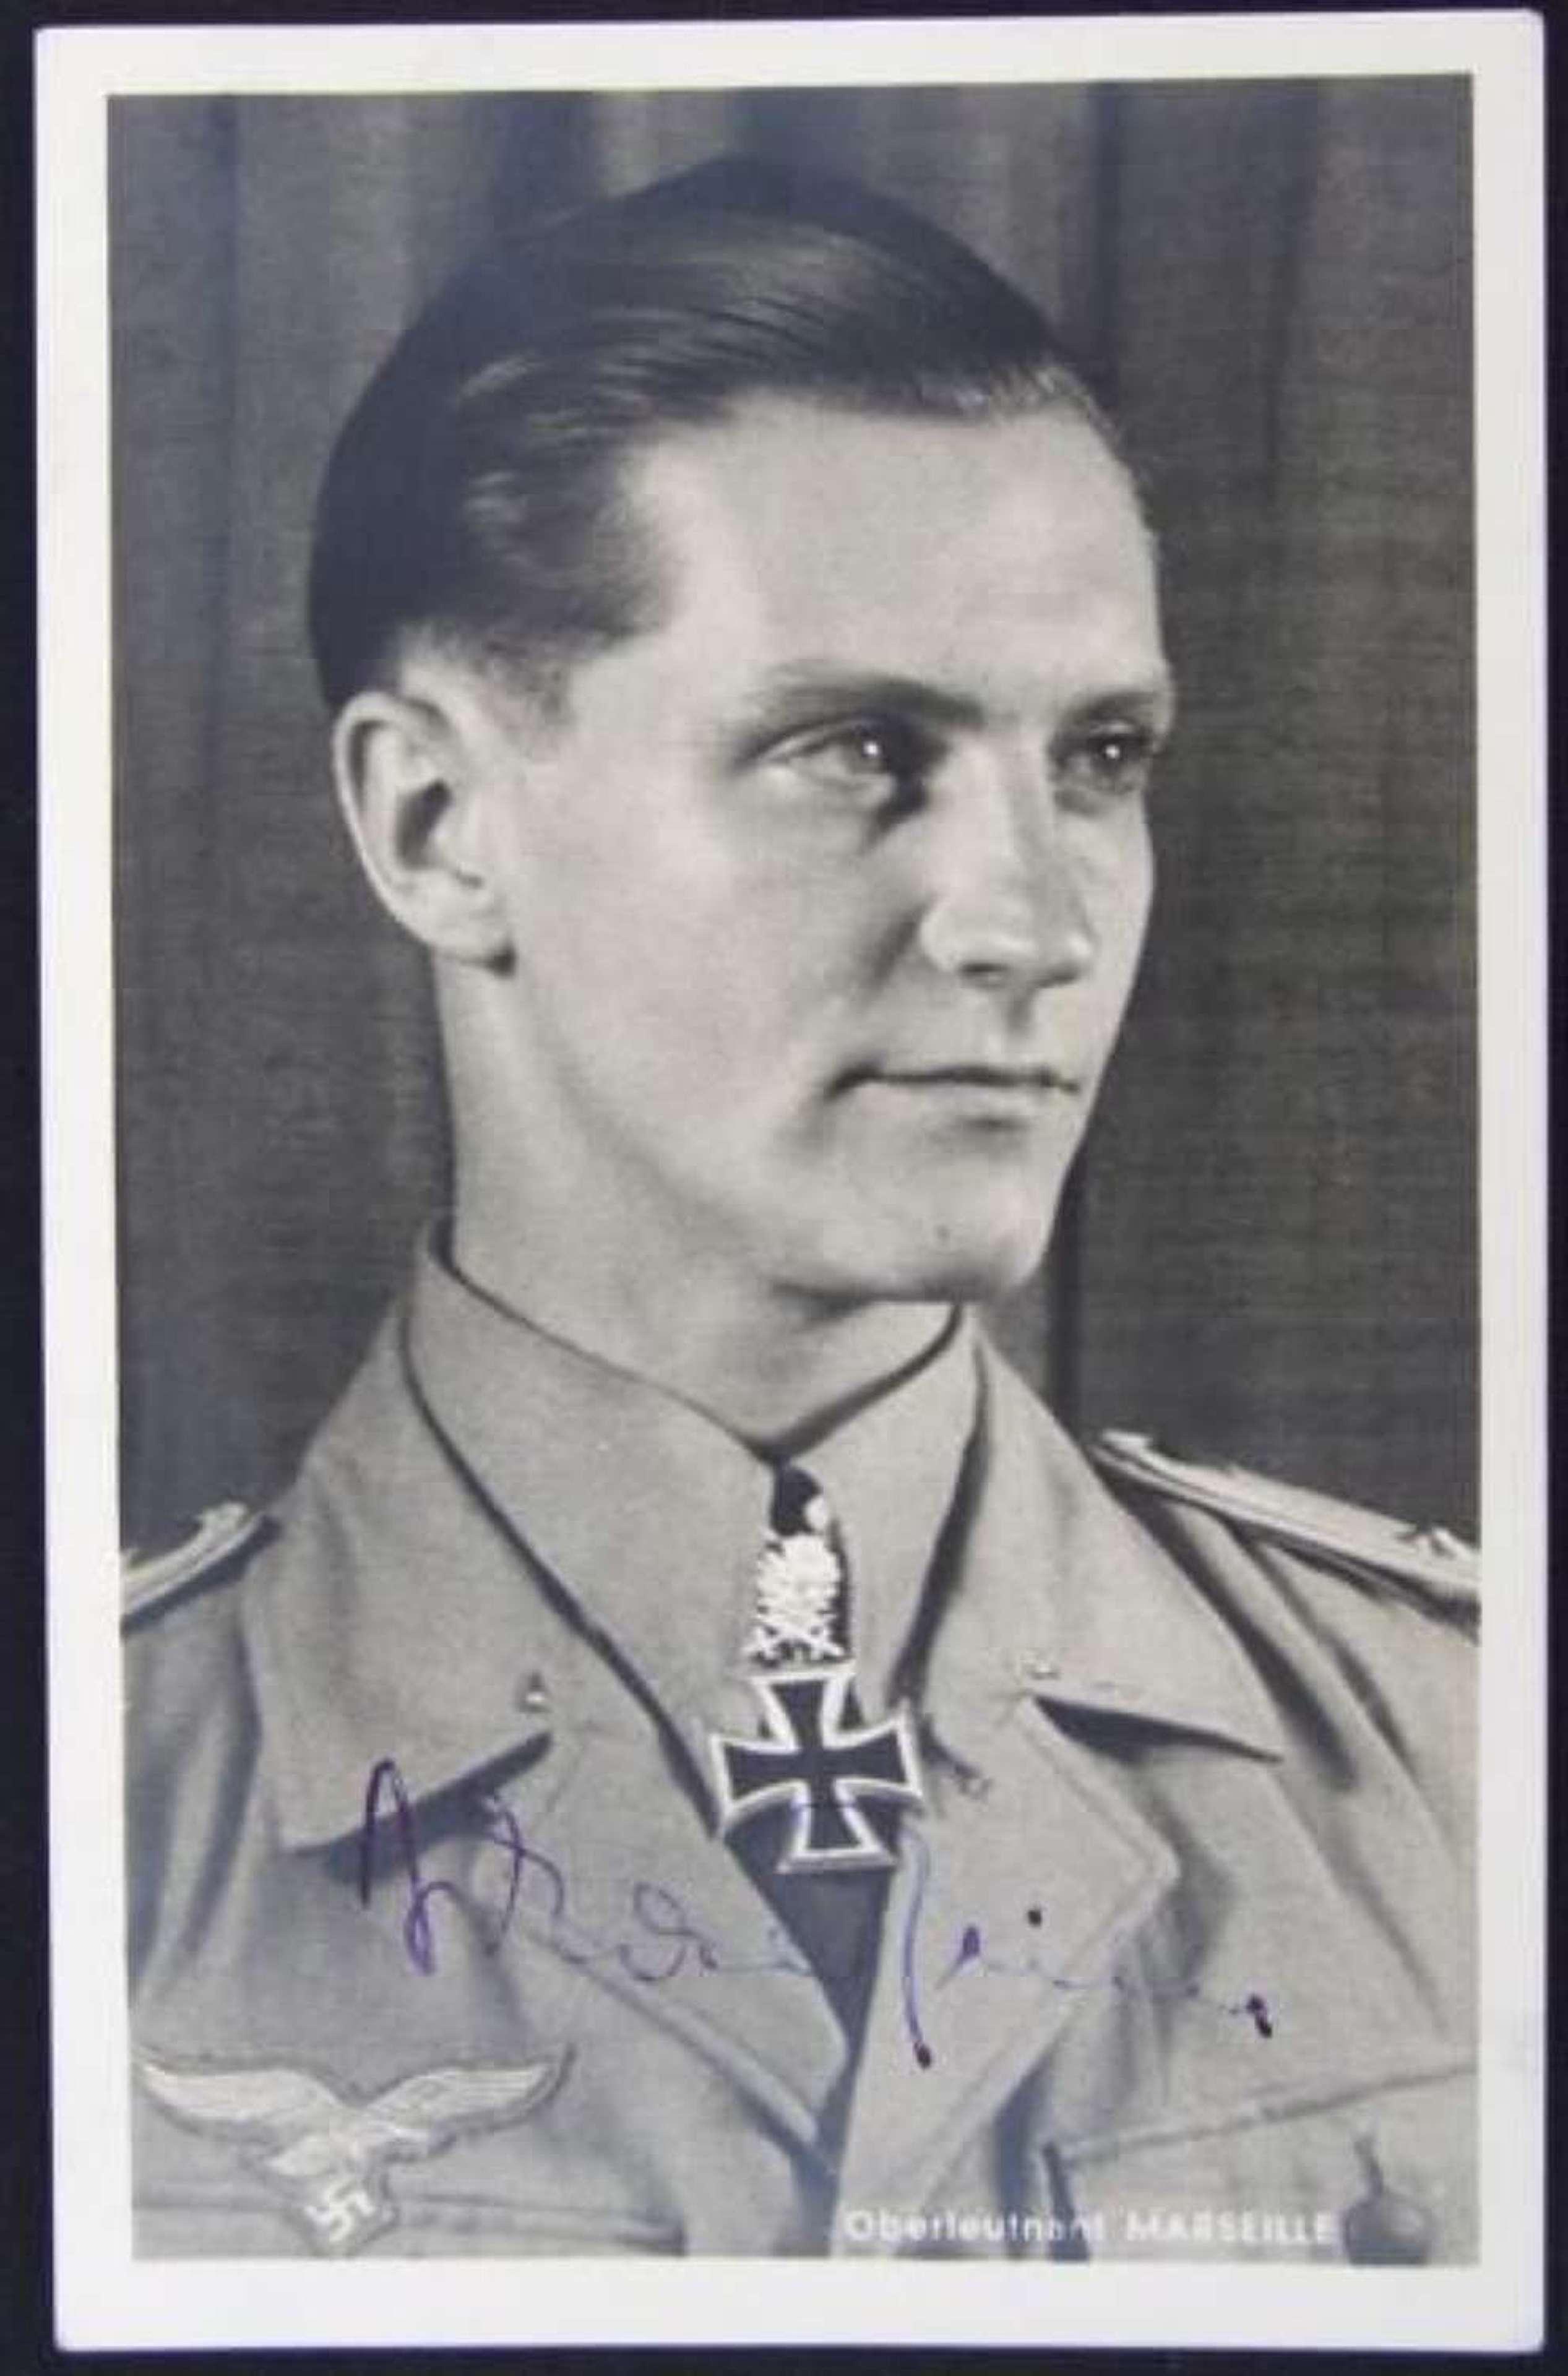 Luftwaffe Ace Hans- Joachim Marseille Autographed Hoffmann Postcard